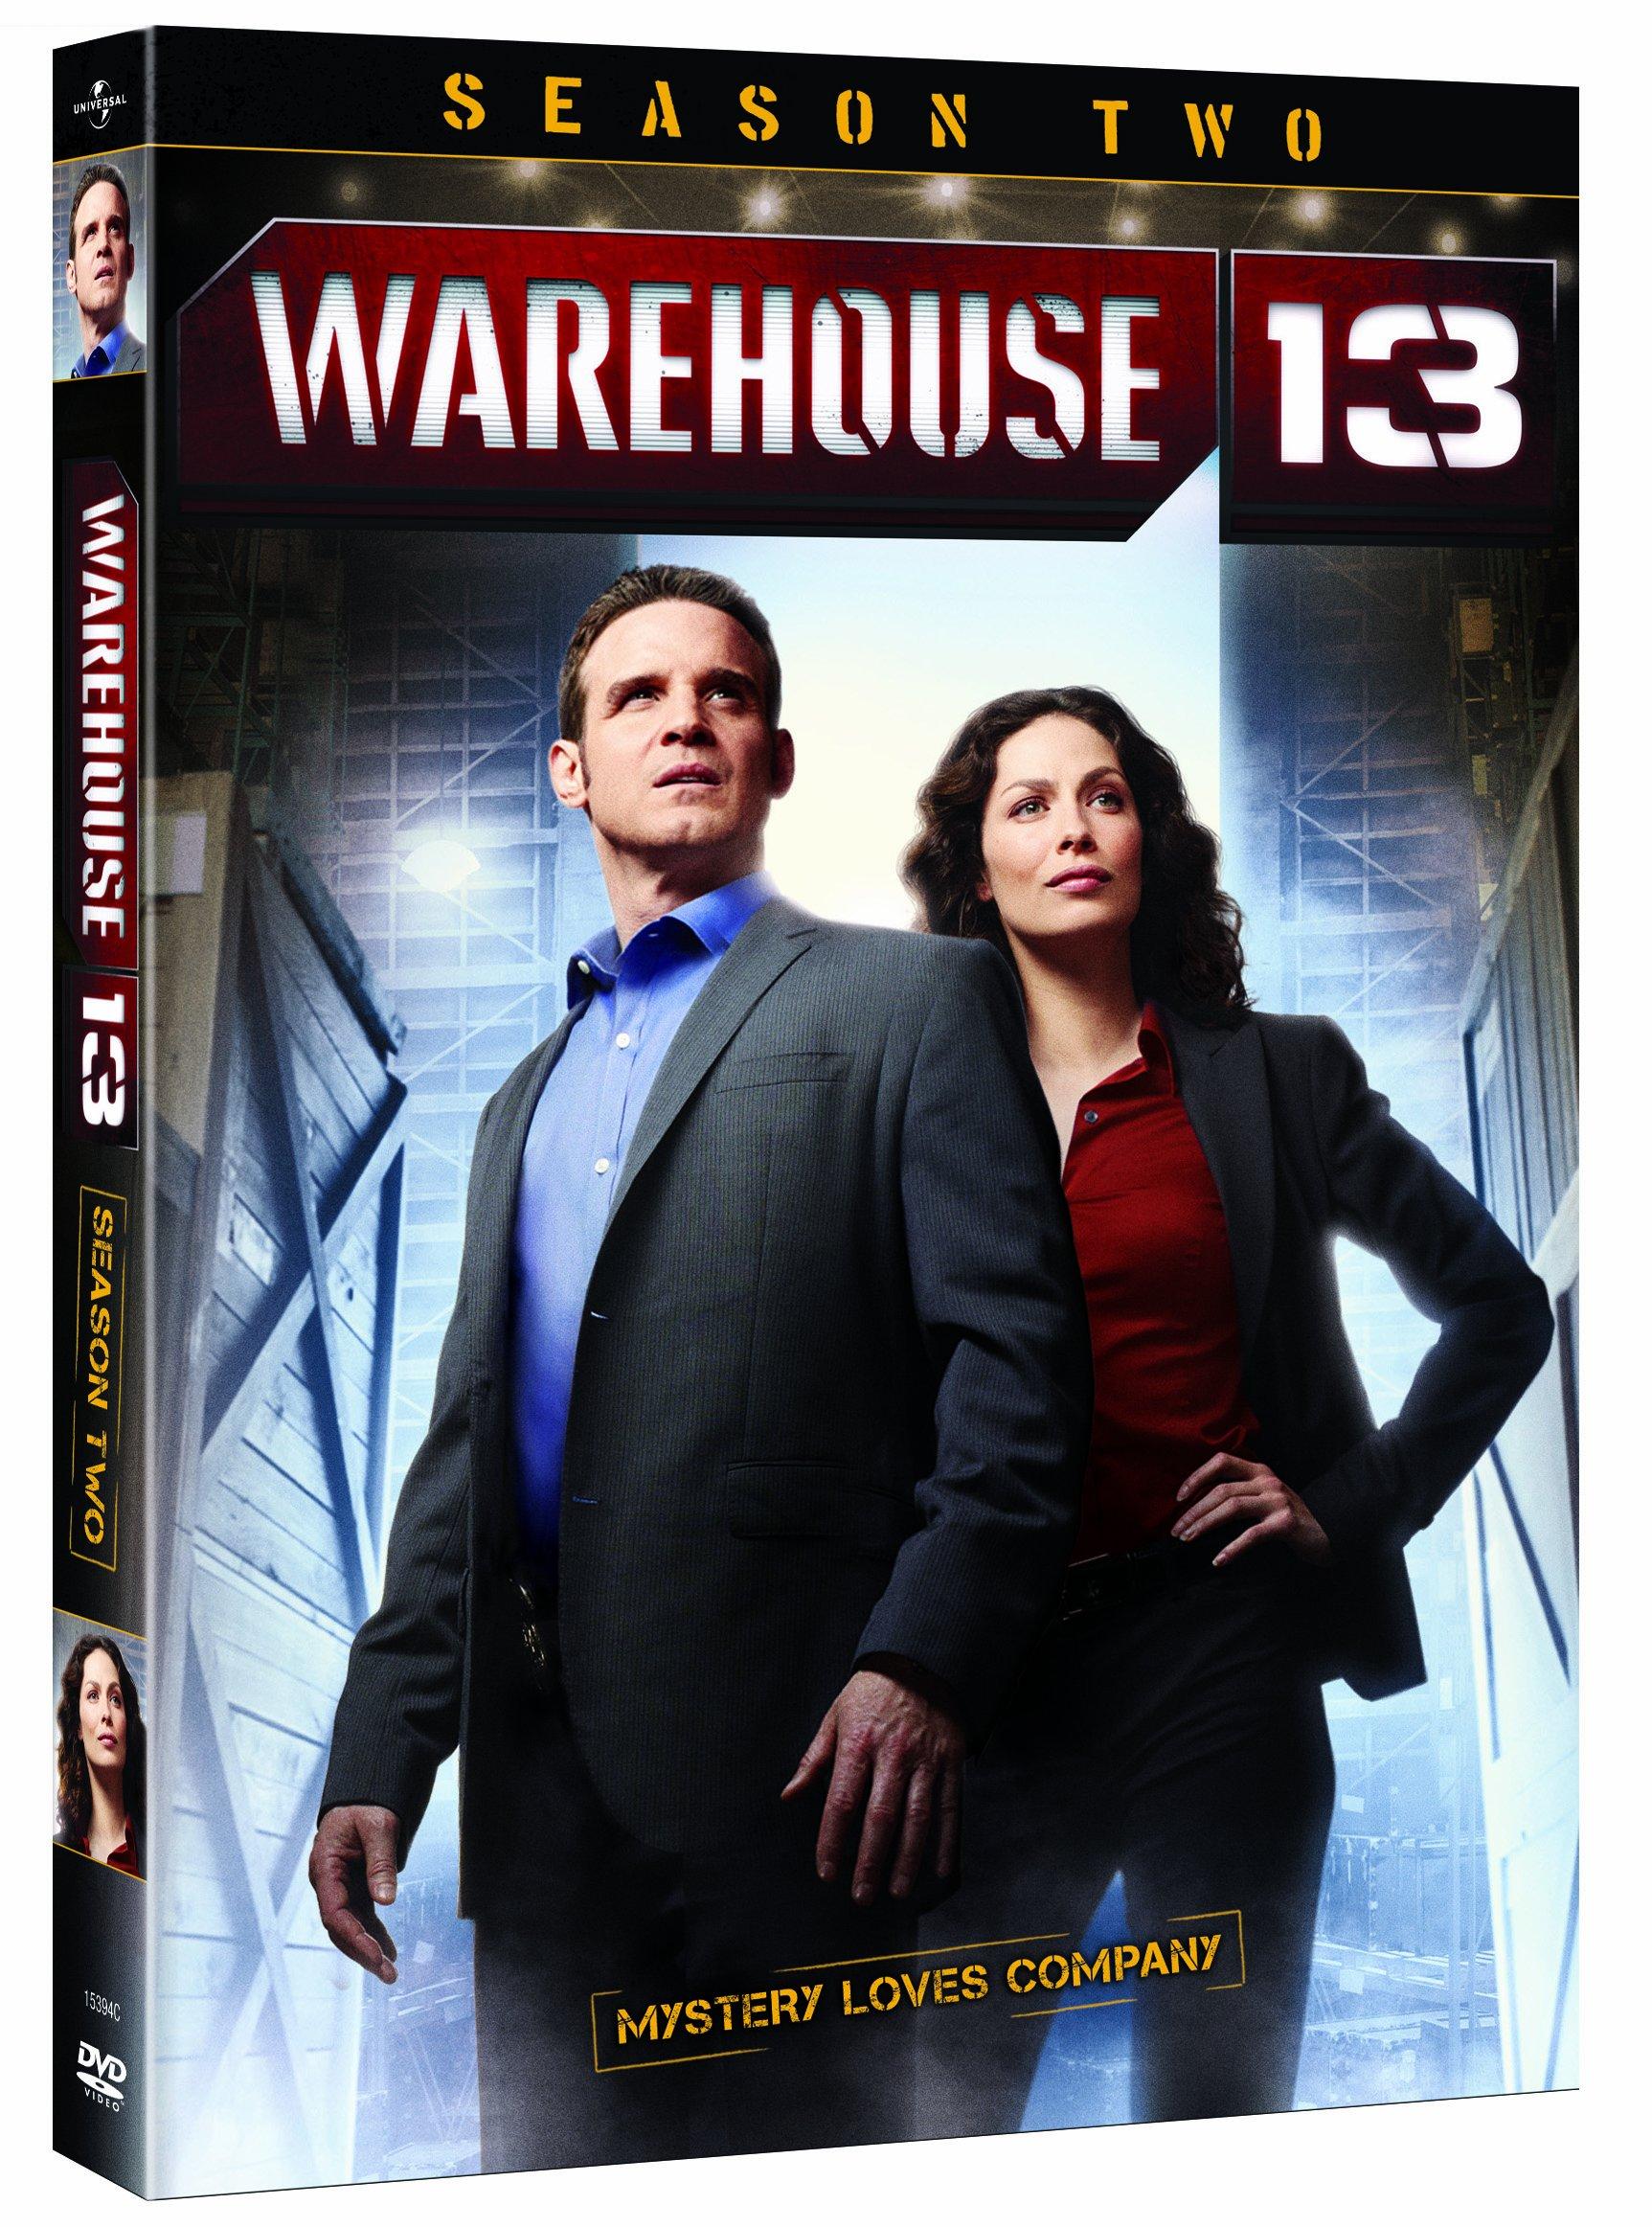 Warehouse 13: Season 2 by Universal Studios Home Entertainment